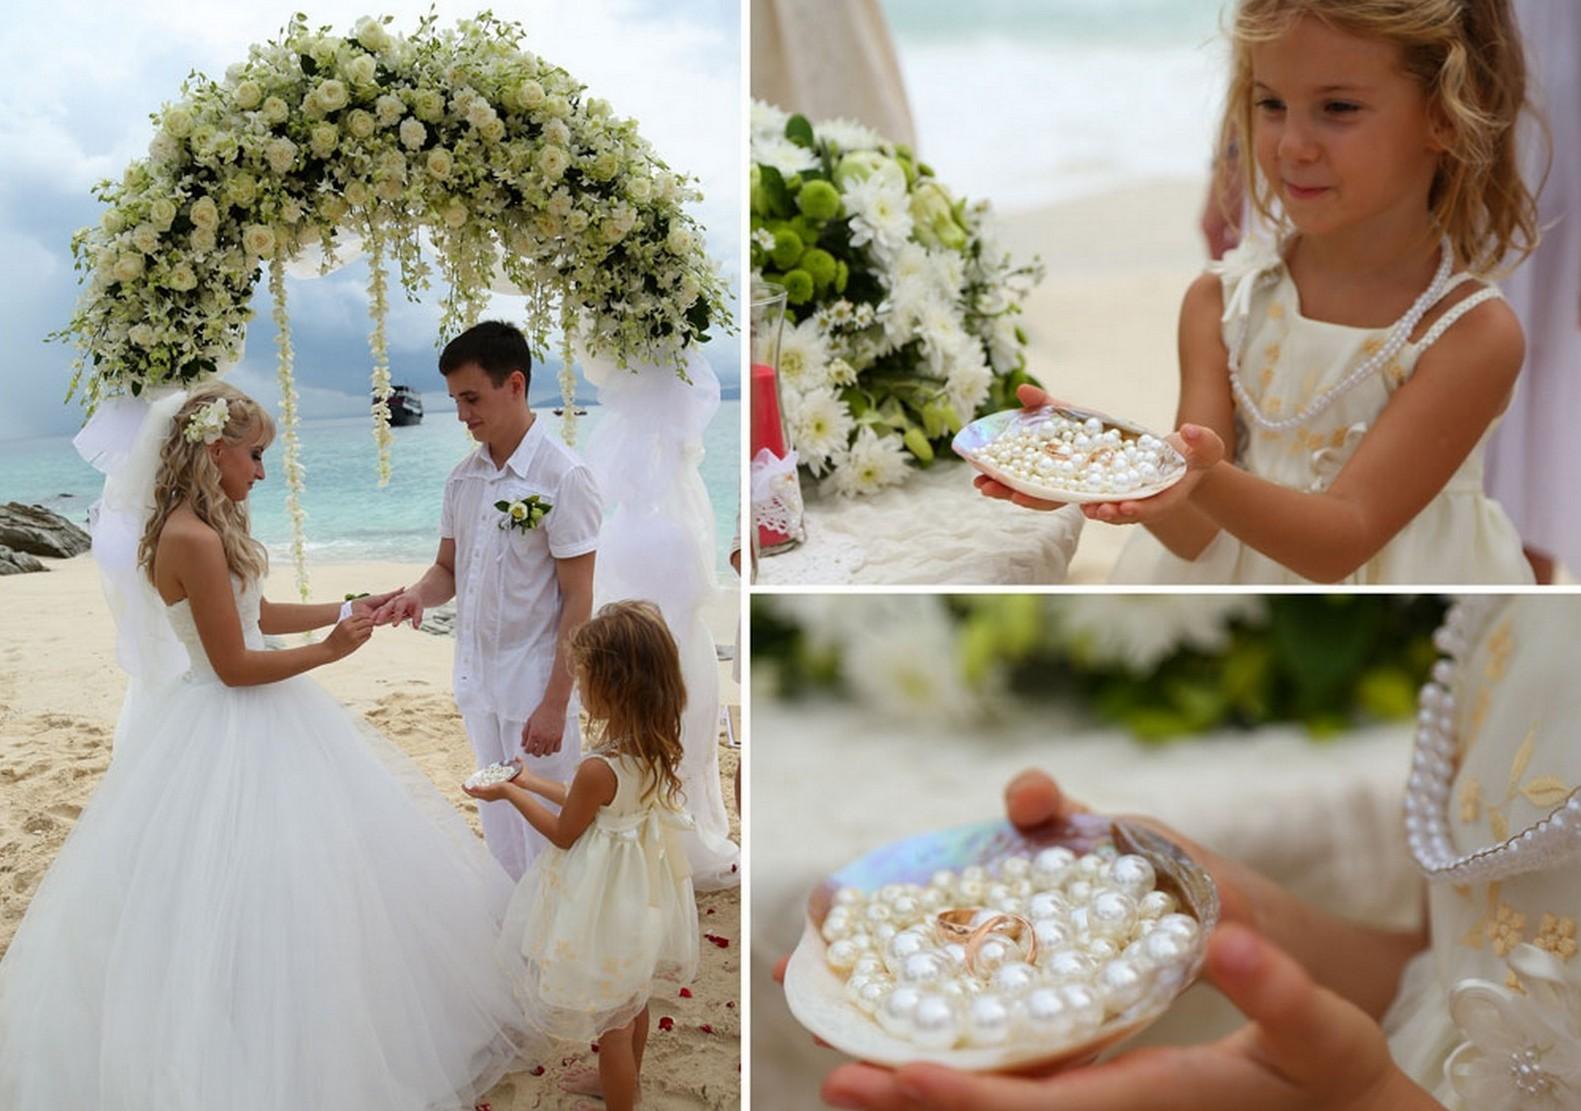 Свадьба в морском стиле - морская свадьба